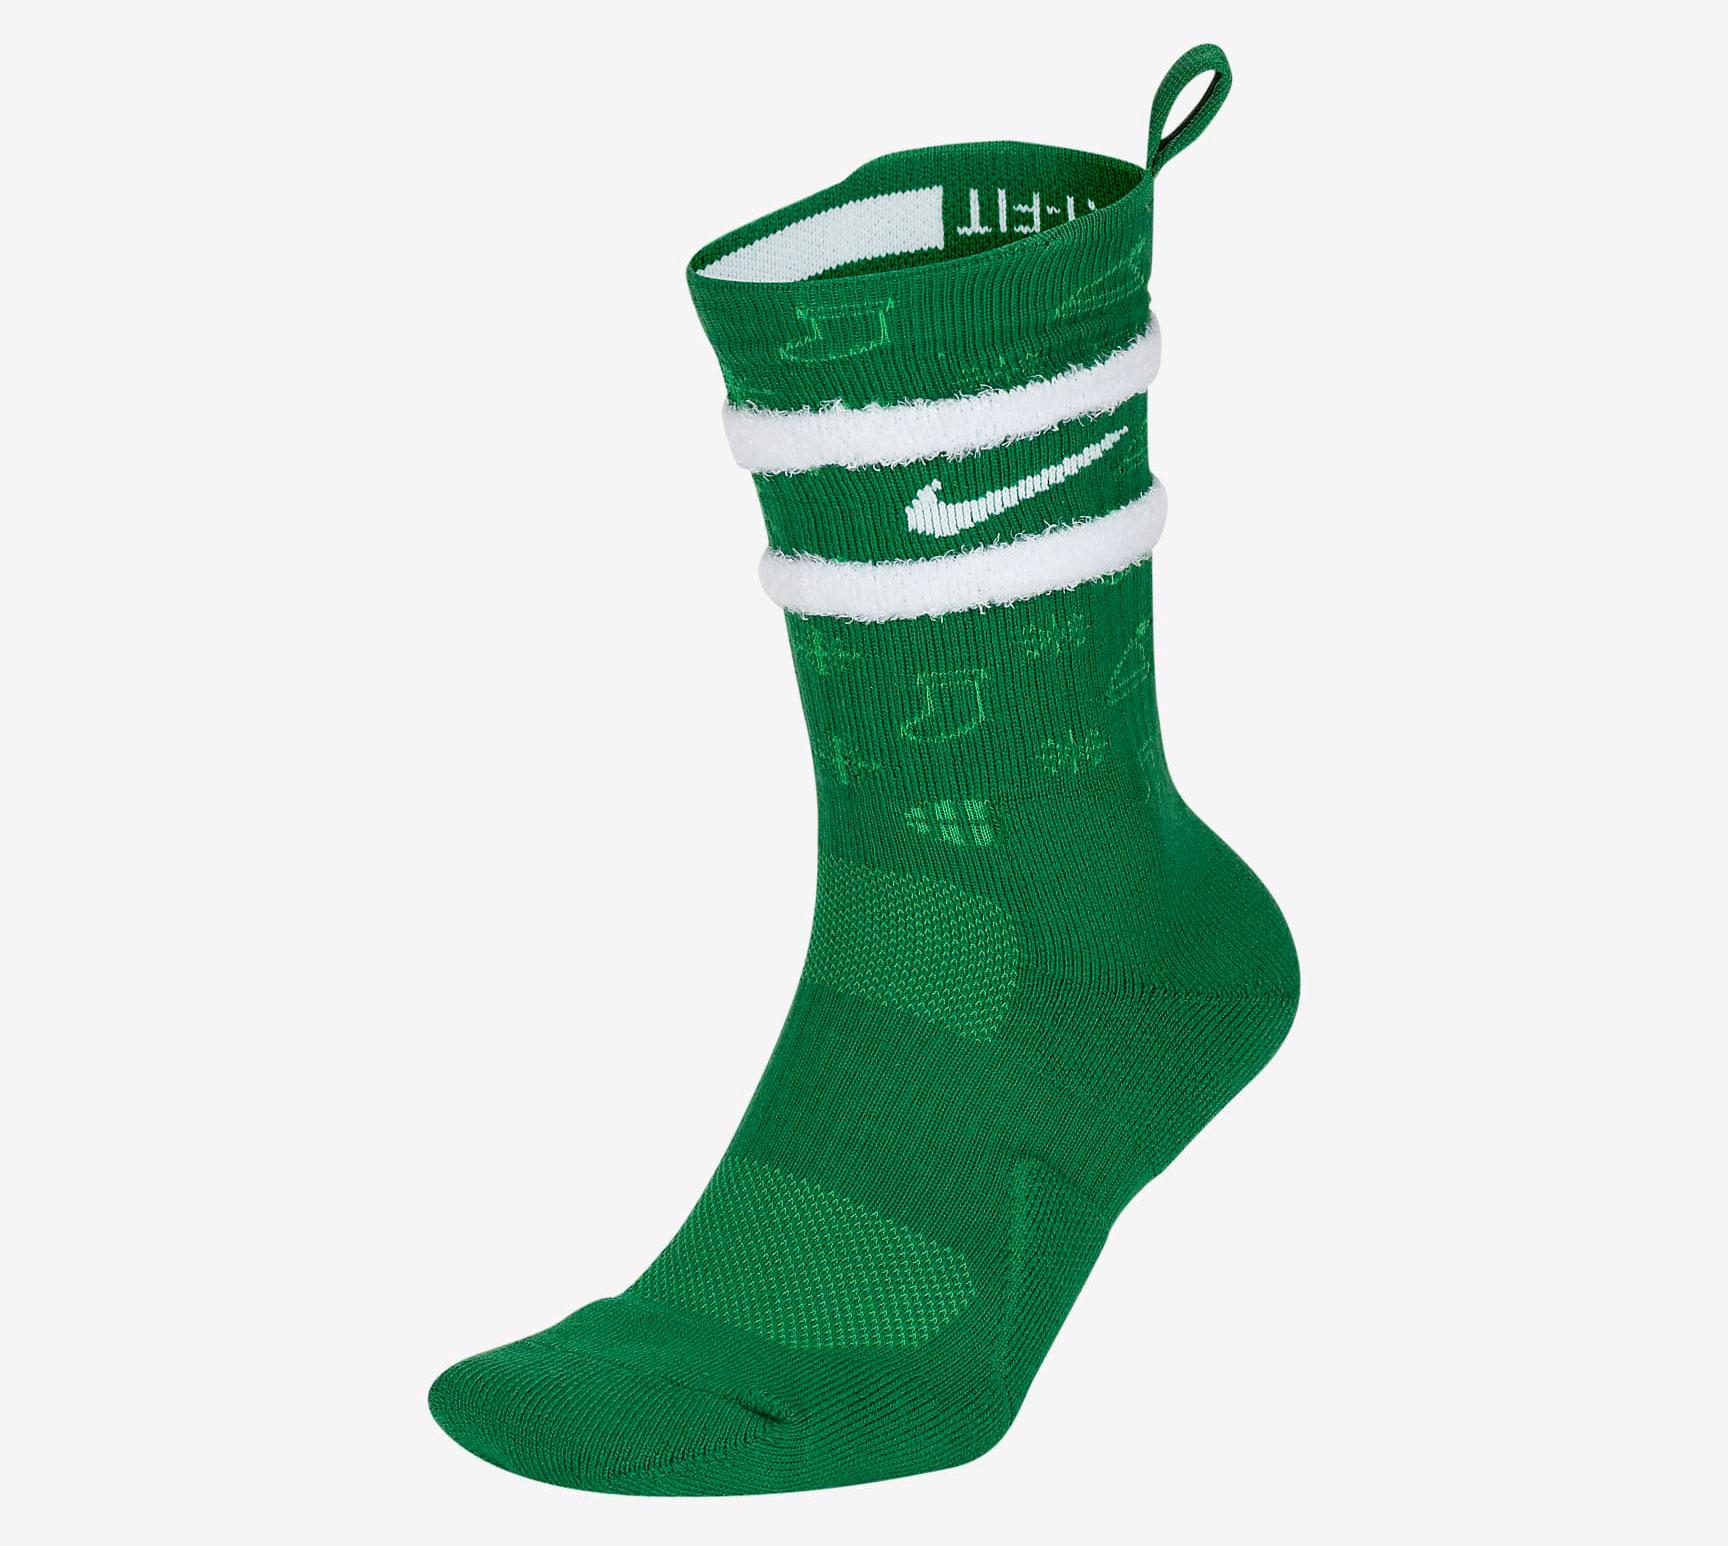 nike-elite-crew-christmas-socks-green